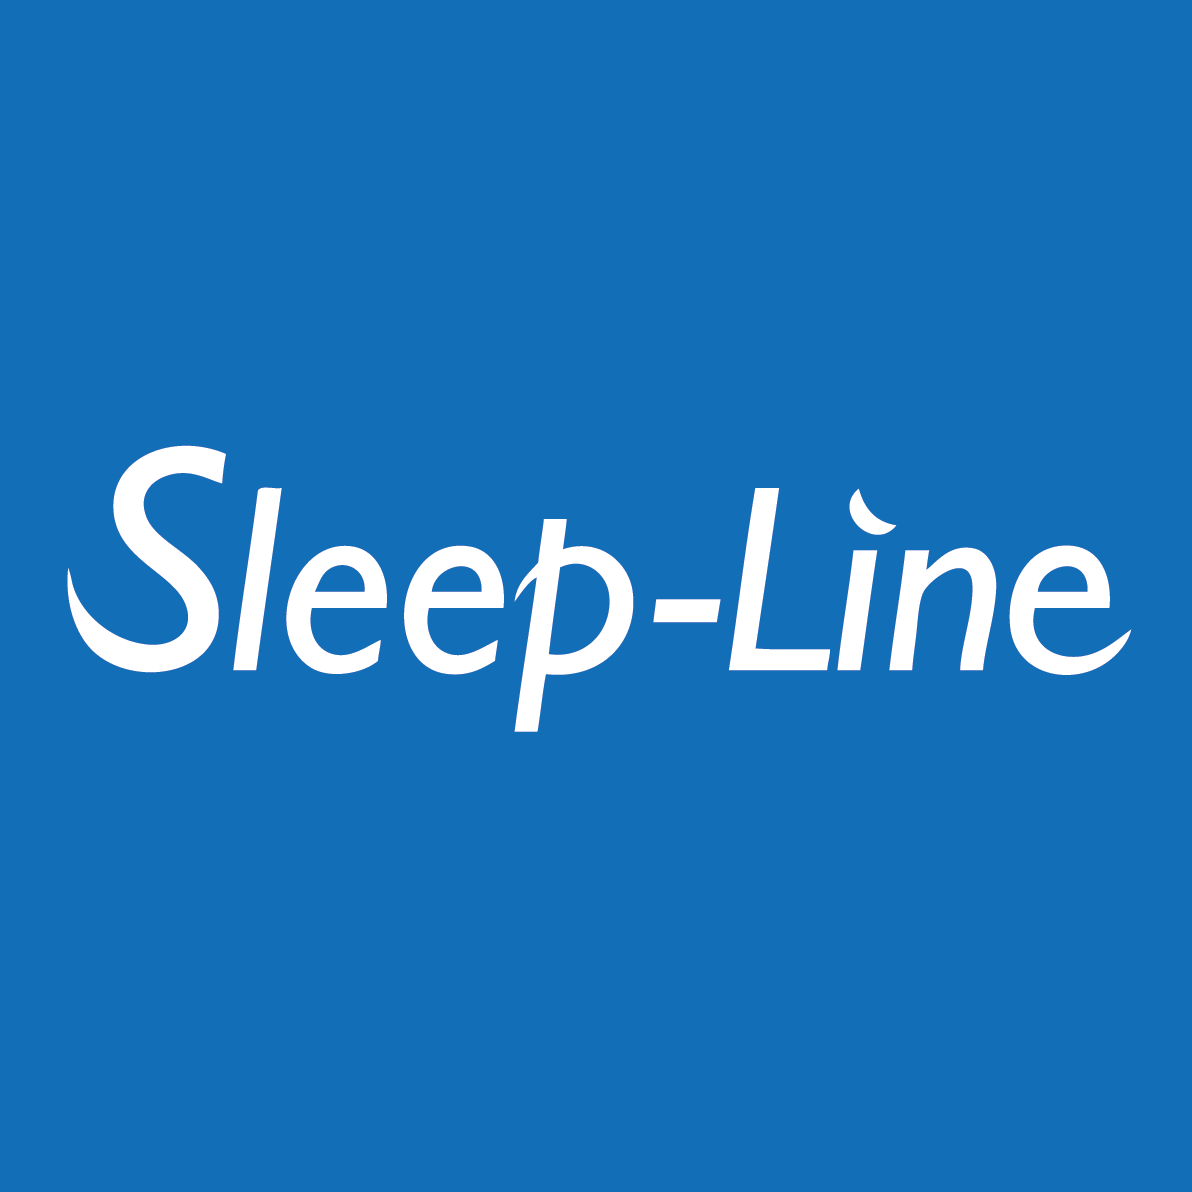 Logo Sleep-Line